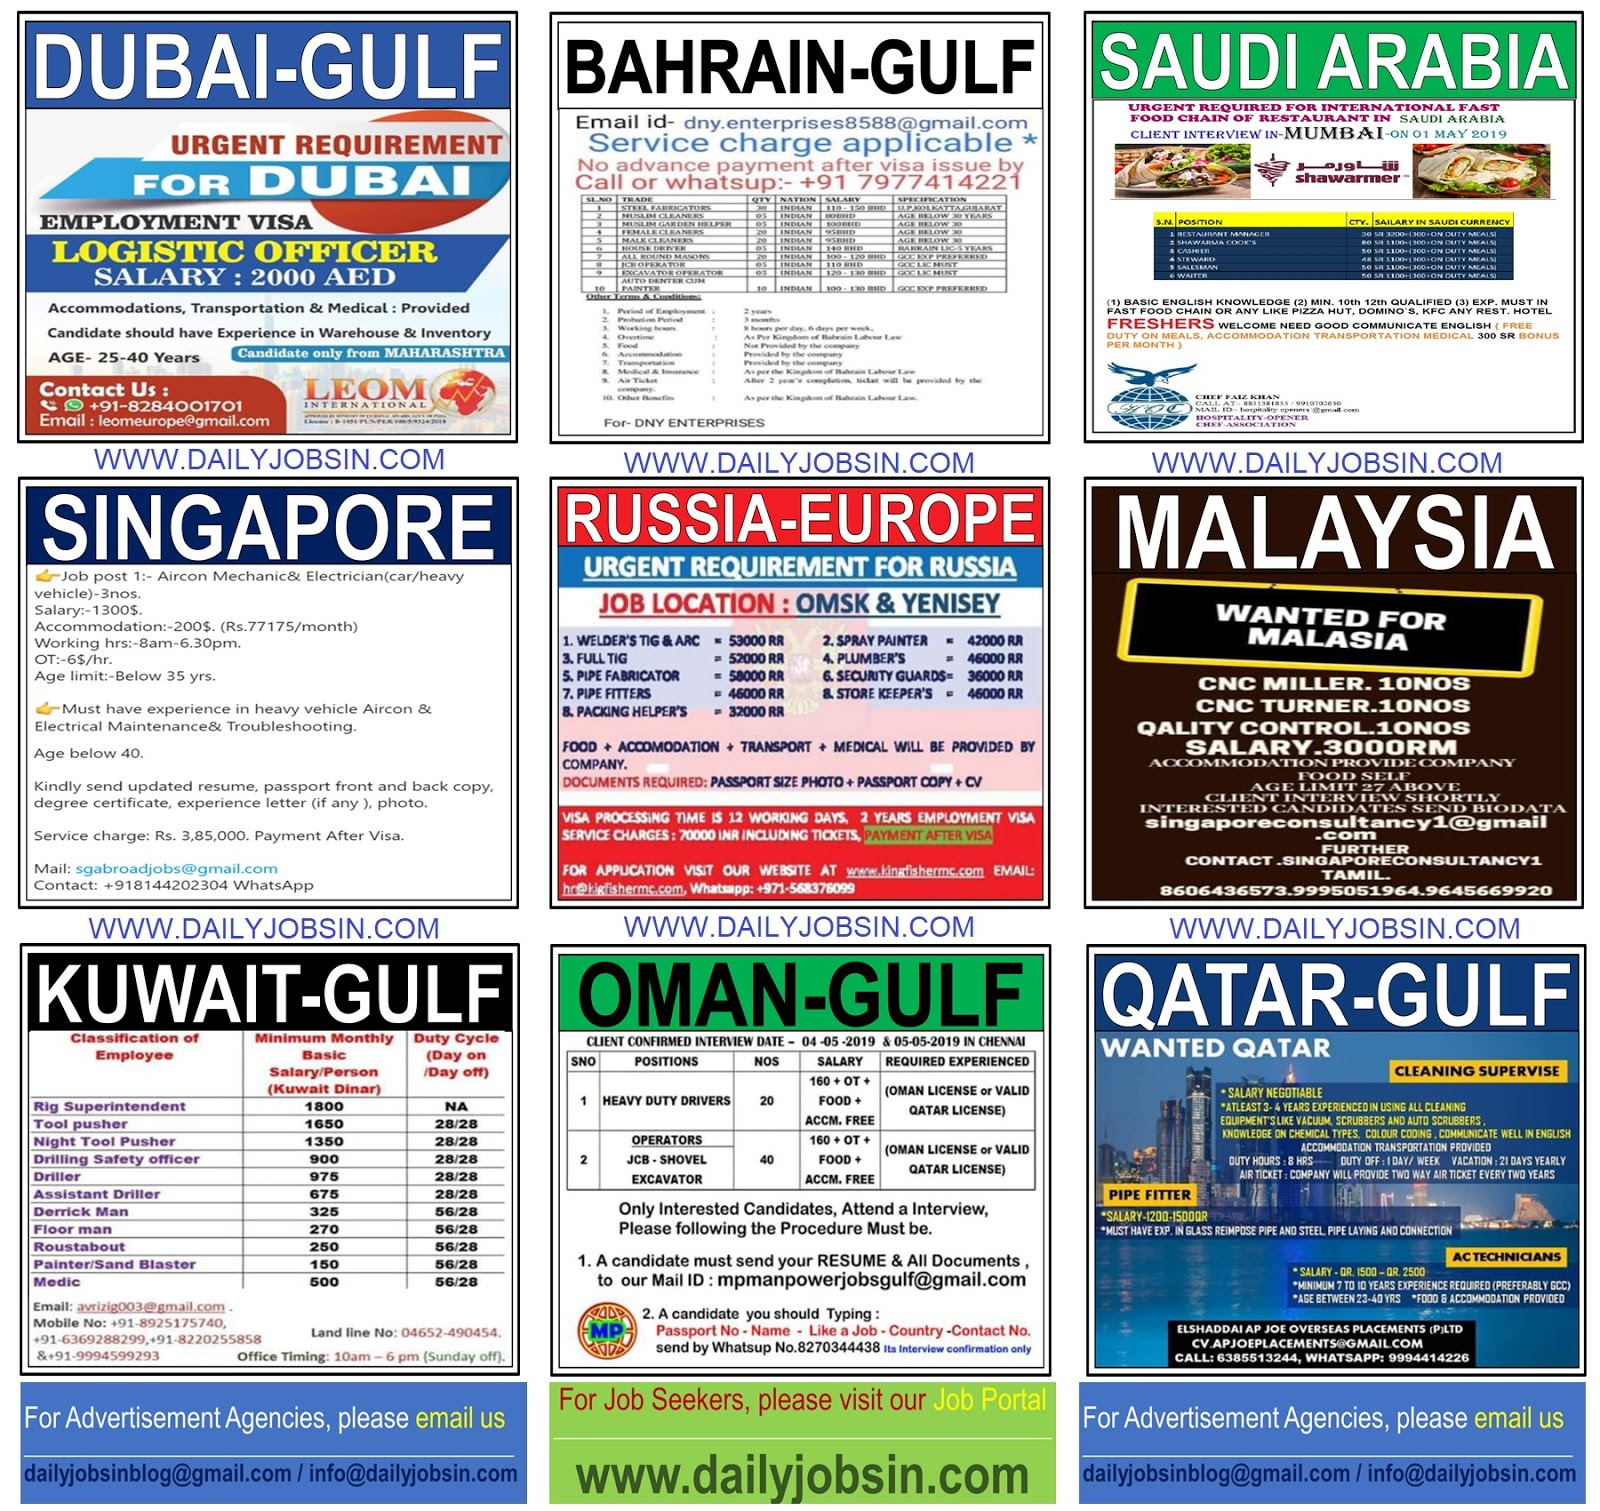 JOBS IN SINGAPORE, RUSSIA-EUROPE, MALAYSIA & GULF COUNTRIES